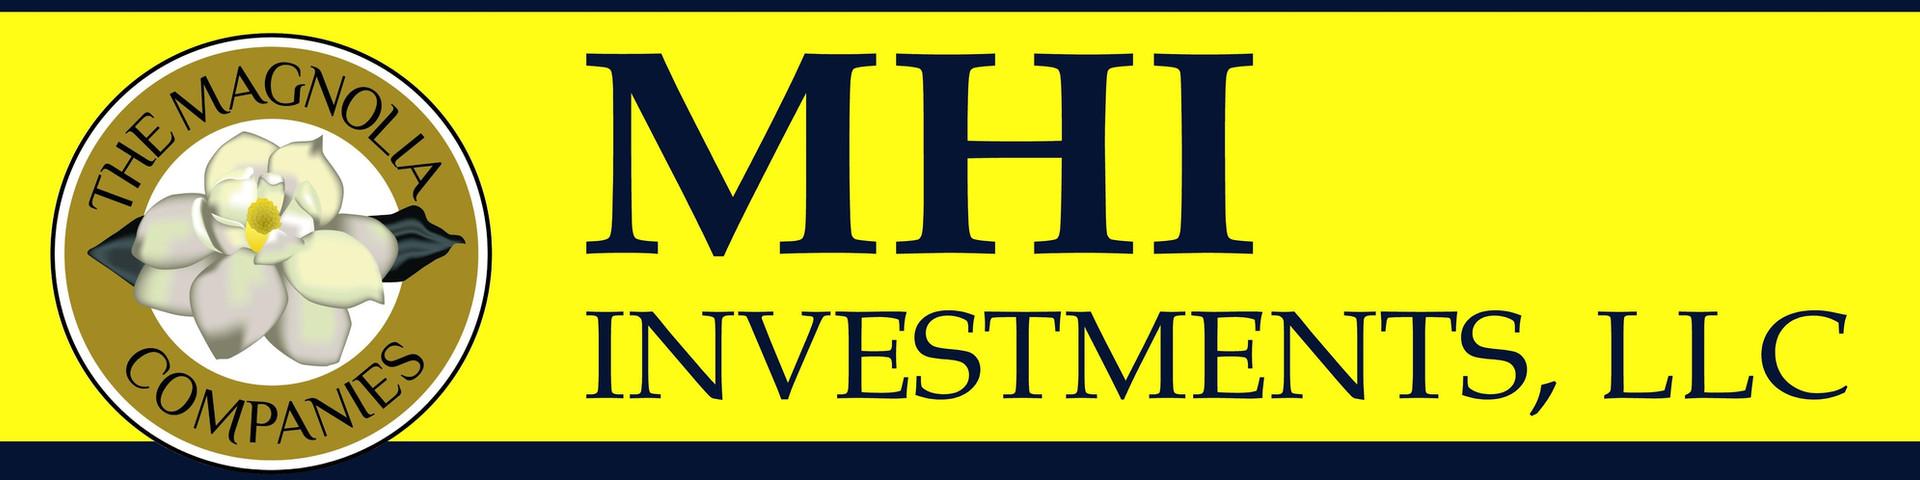 MHIInvestmentsLLC 08.2017.jpg